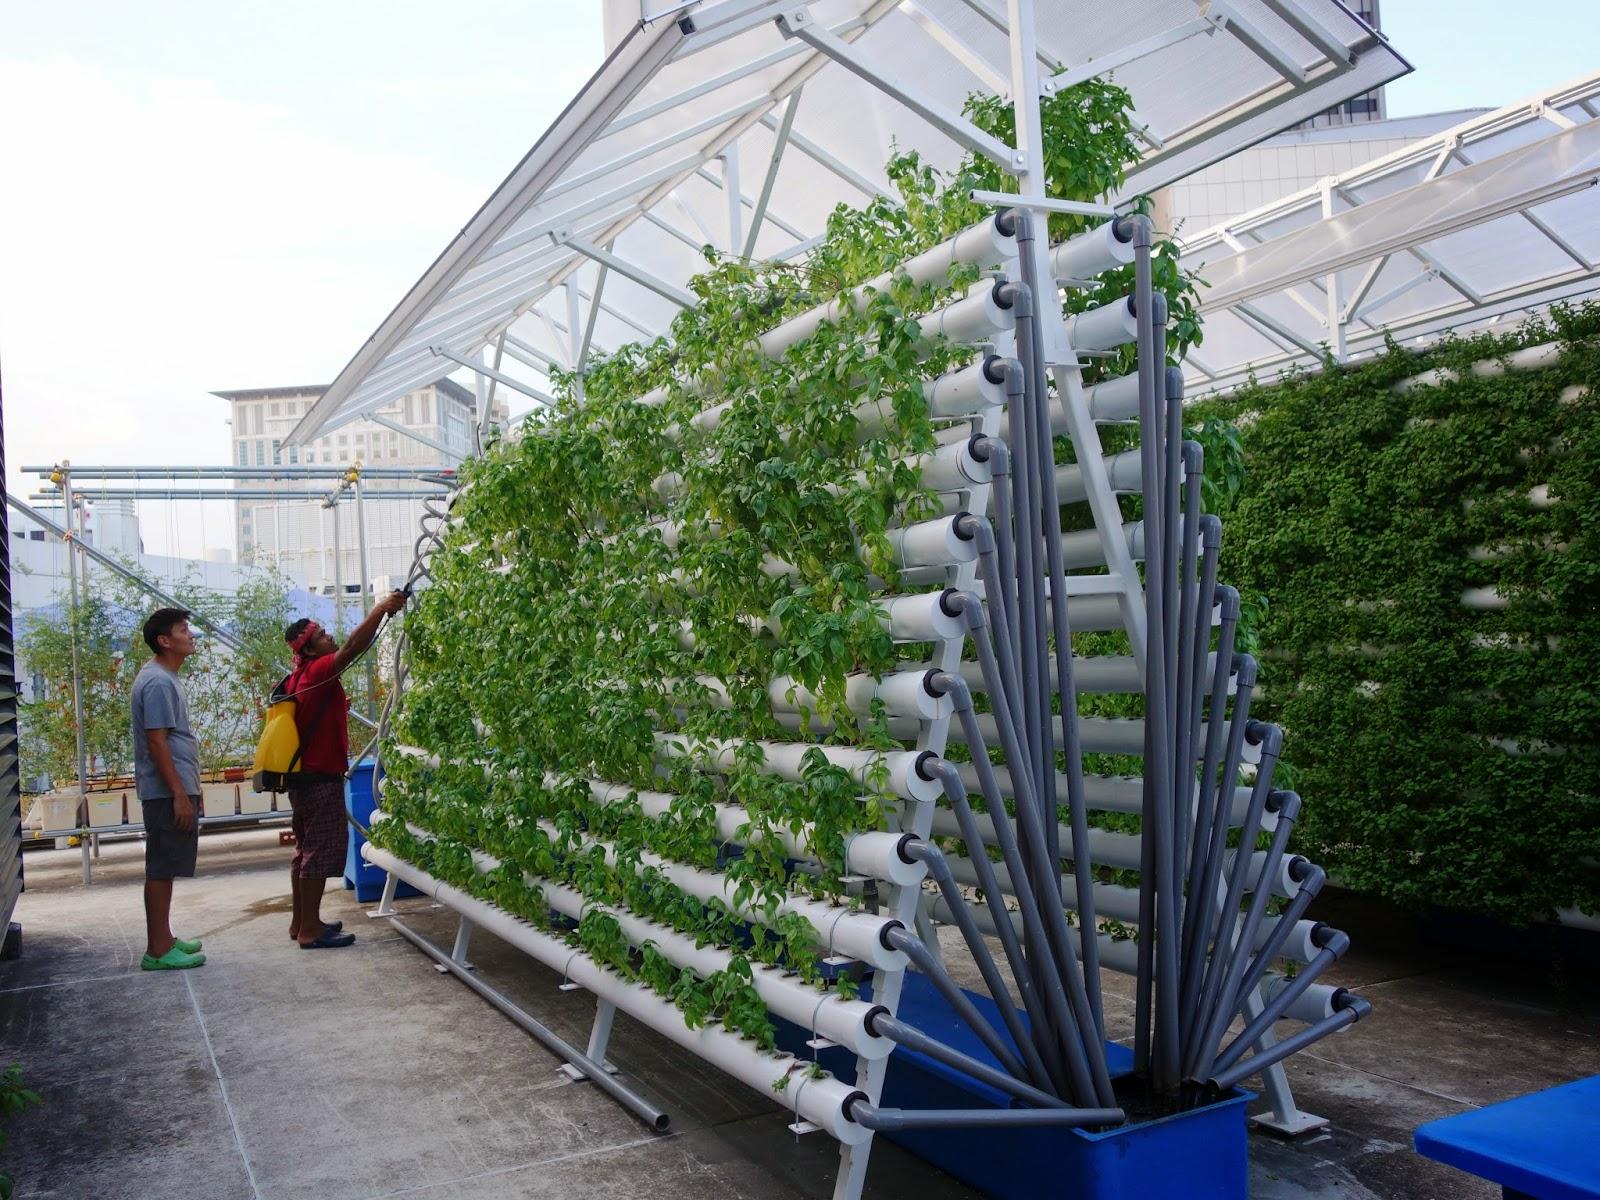 effectiveness of rooftop gardens urban ecology lsm4265. Black Bedroom Furniture Sets. Home Design Ideas